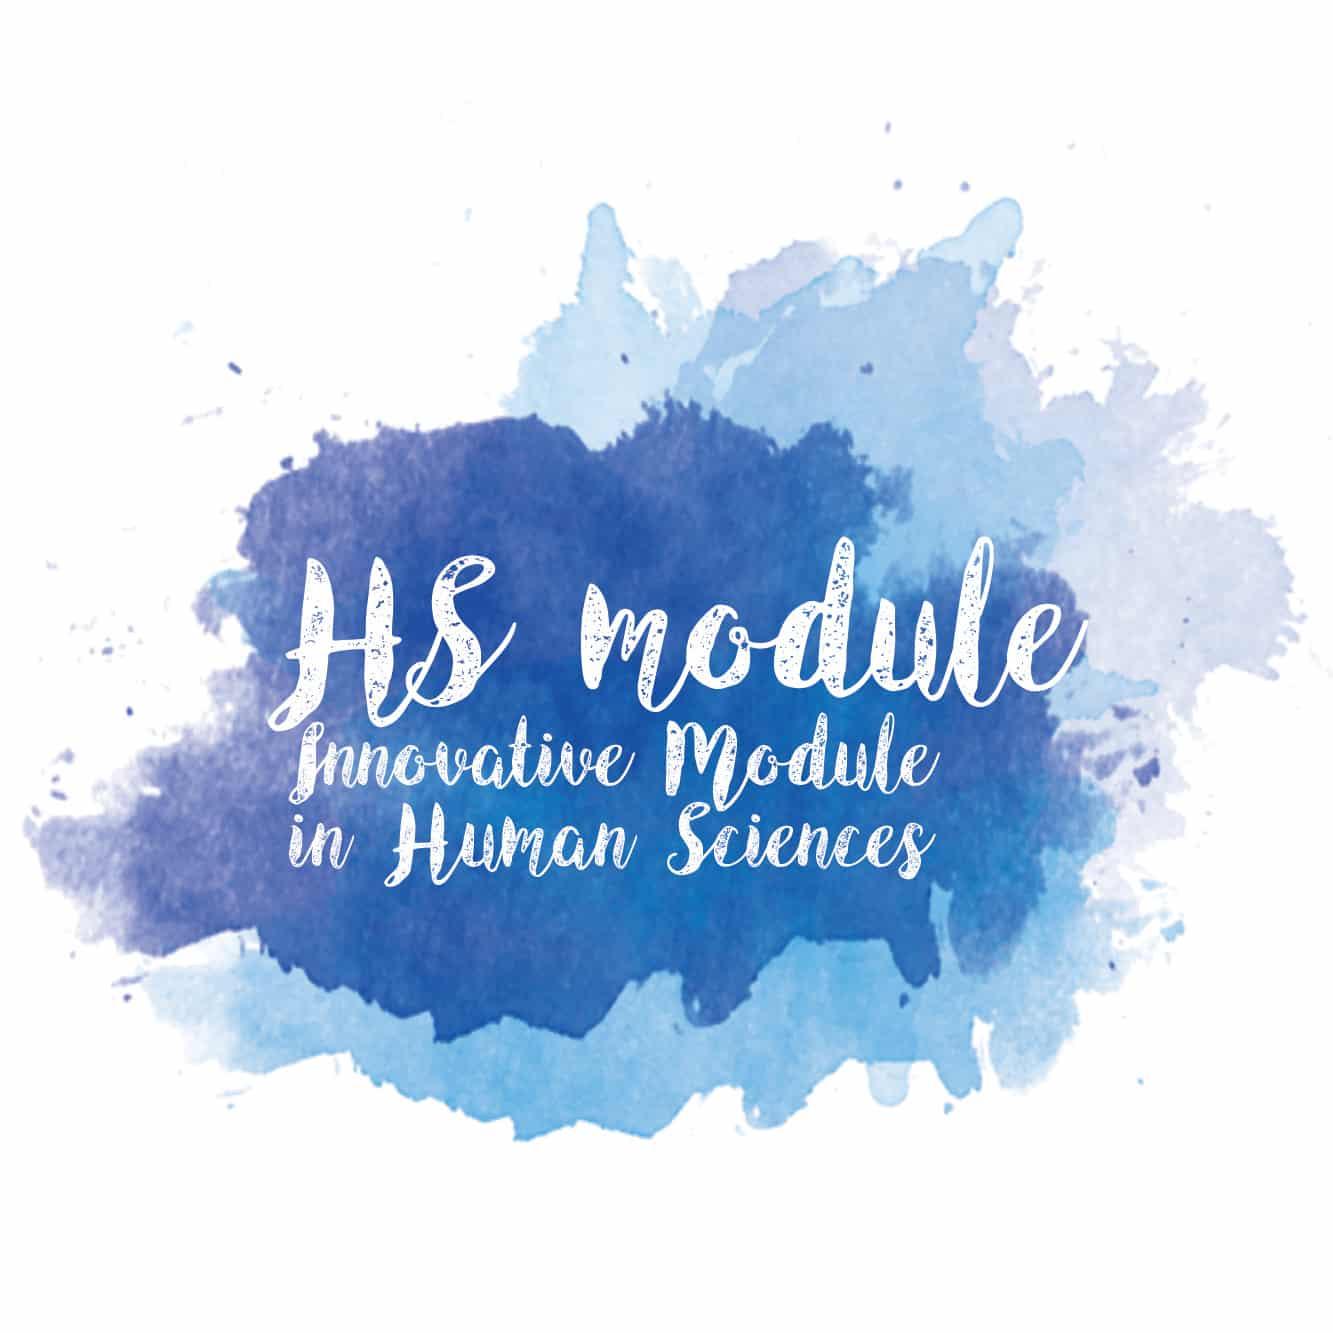 High sensitivity – Innovative Module in human sciences. (HSP)